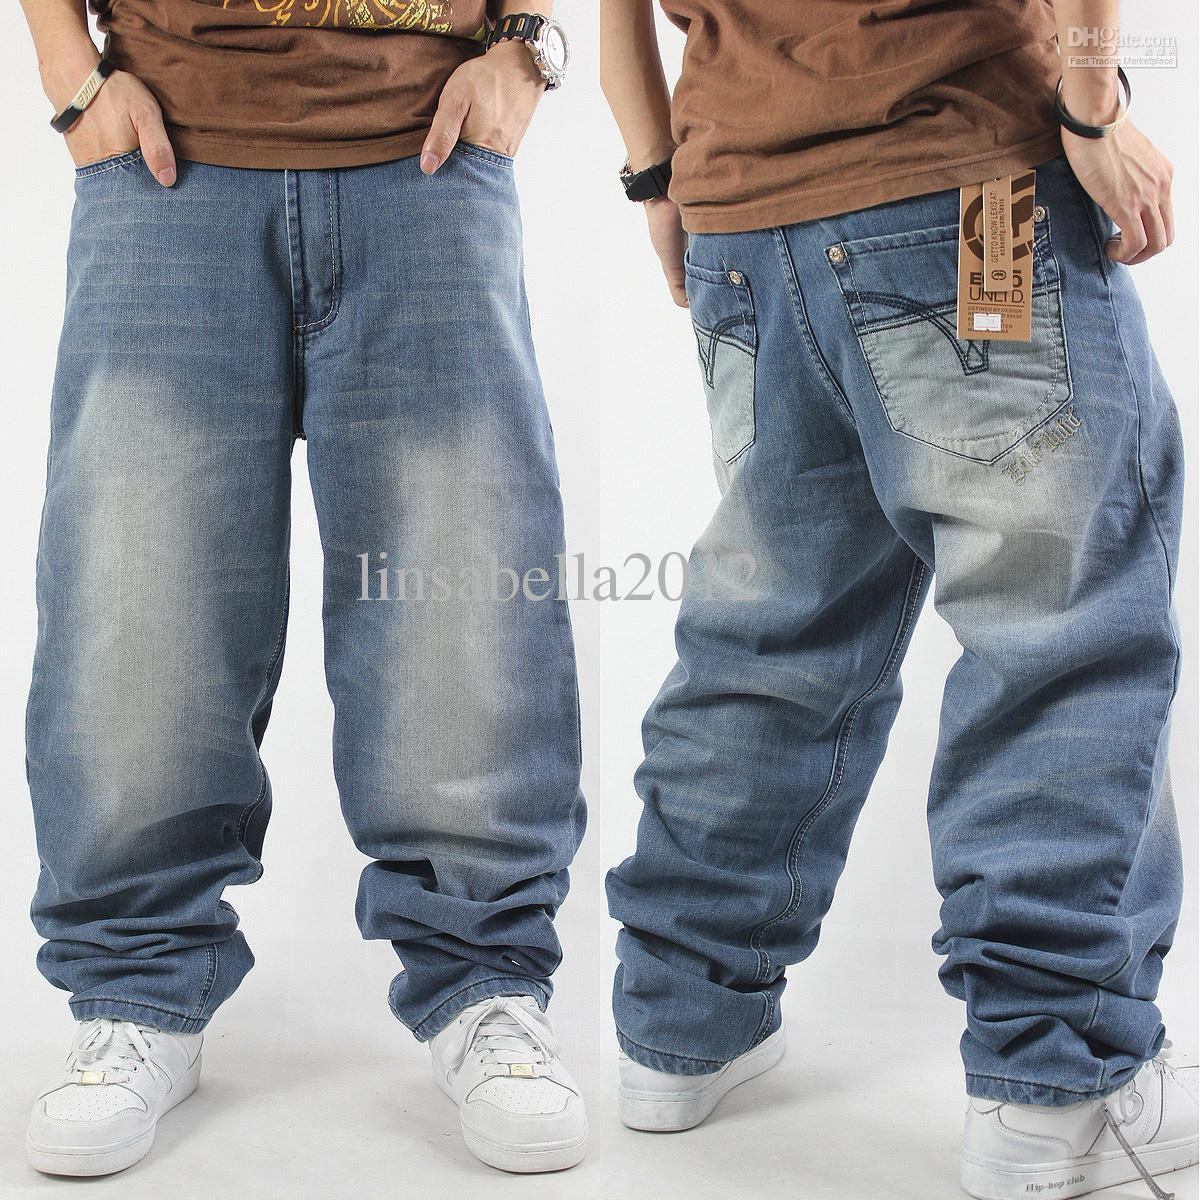 Hip hop clothes stores